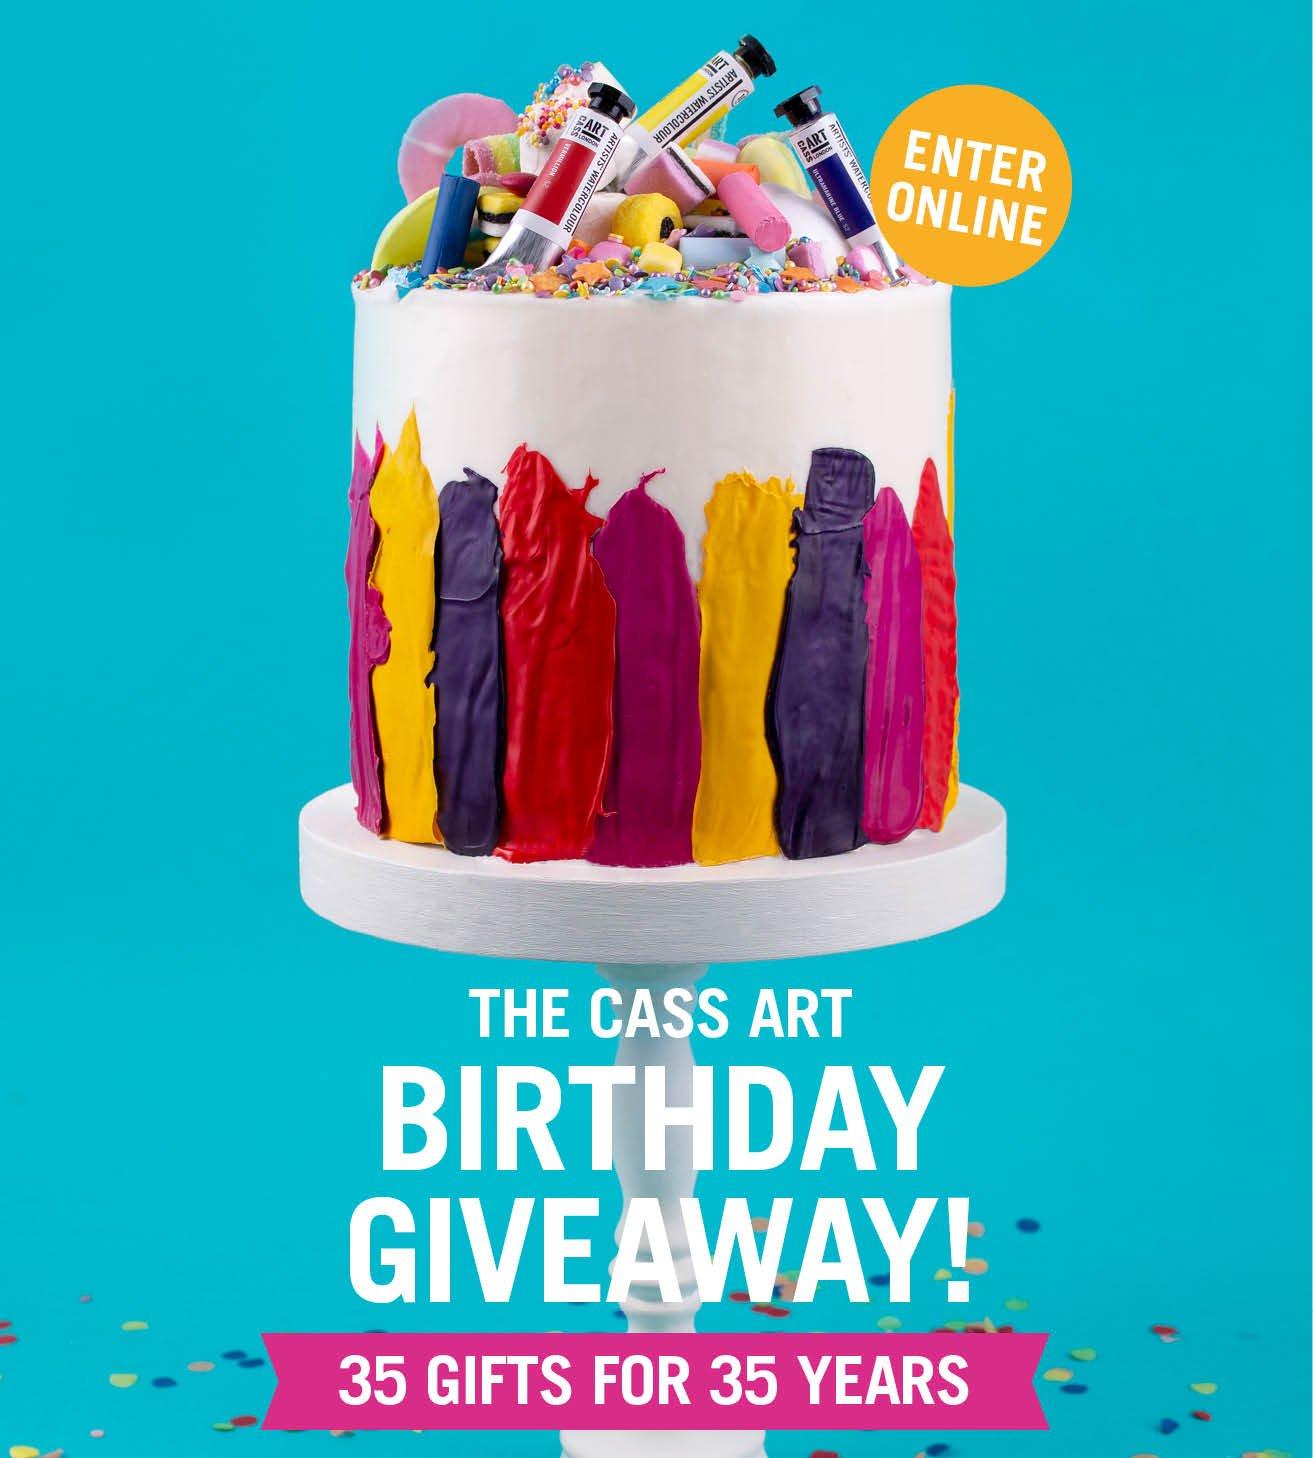 Groovy Cass Art Enter The Cass Art Birthday Giveaway Milled Funny Birthday Cards Online Hetedamsfinfo